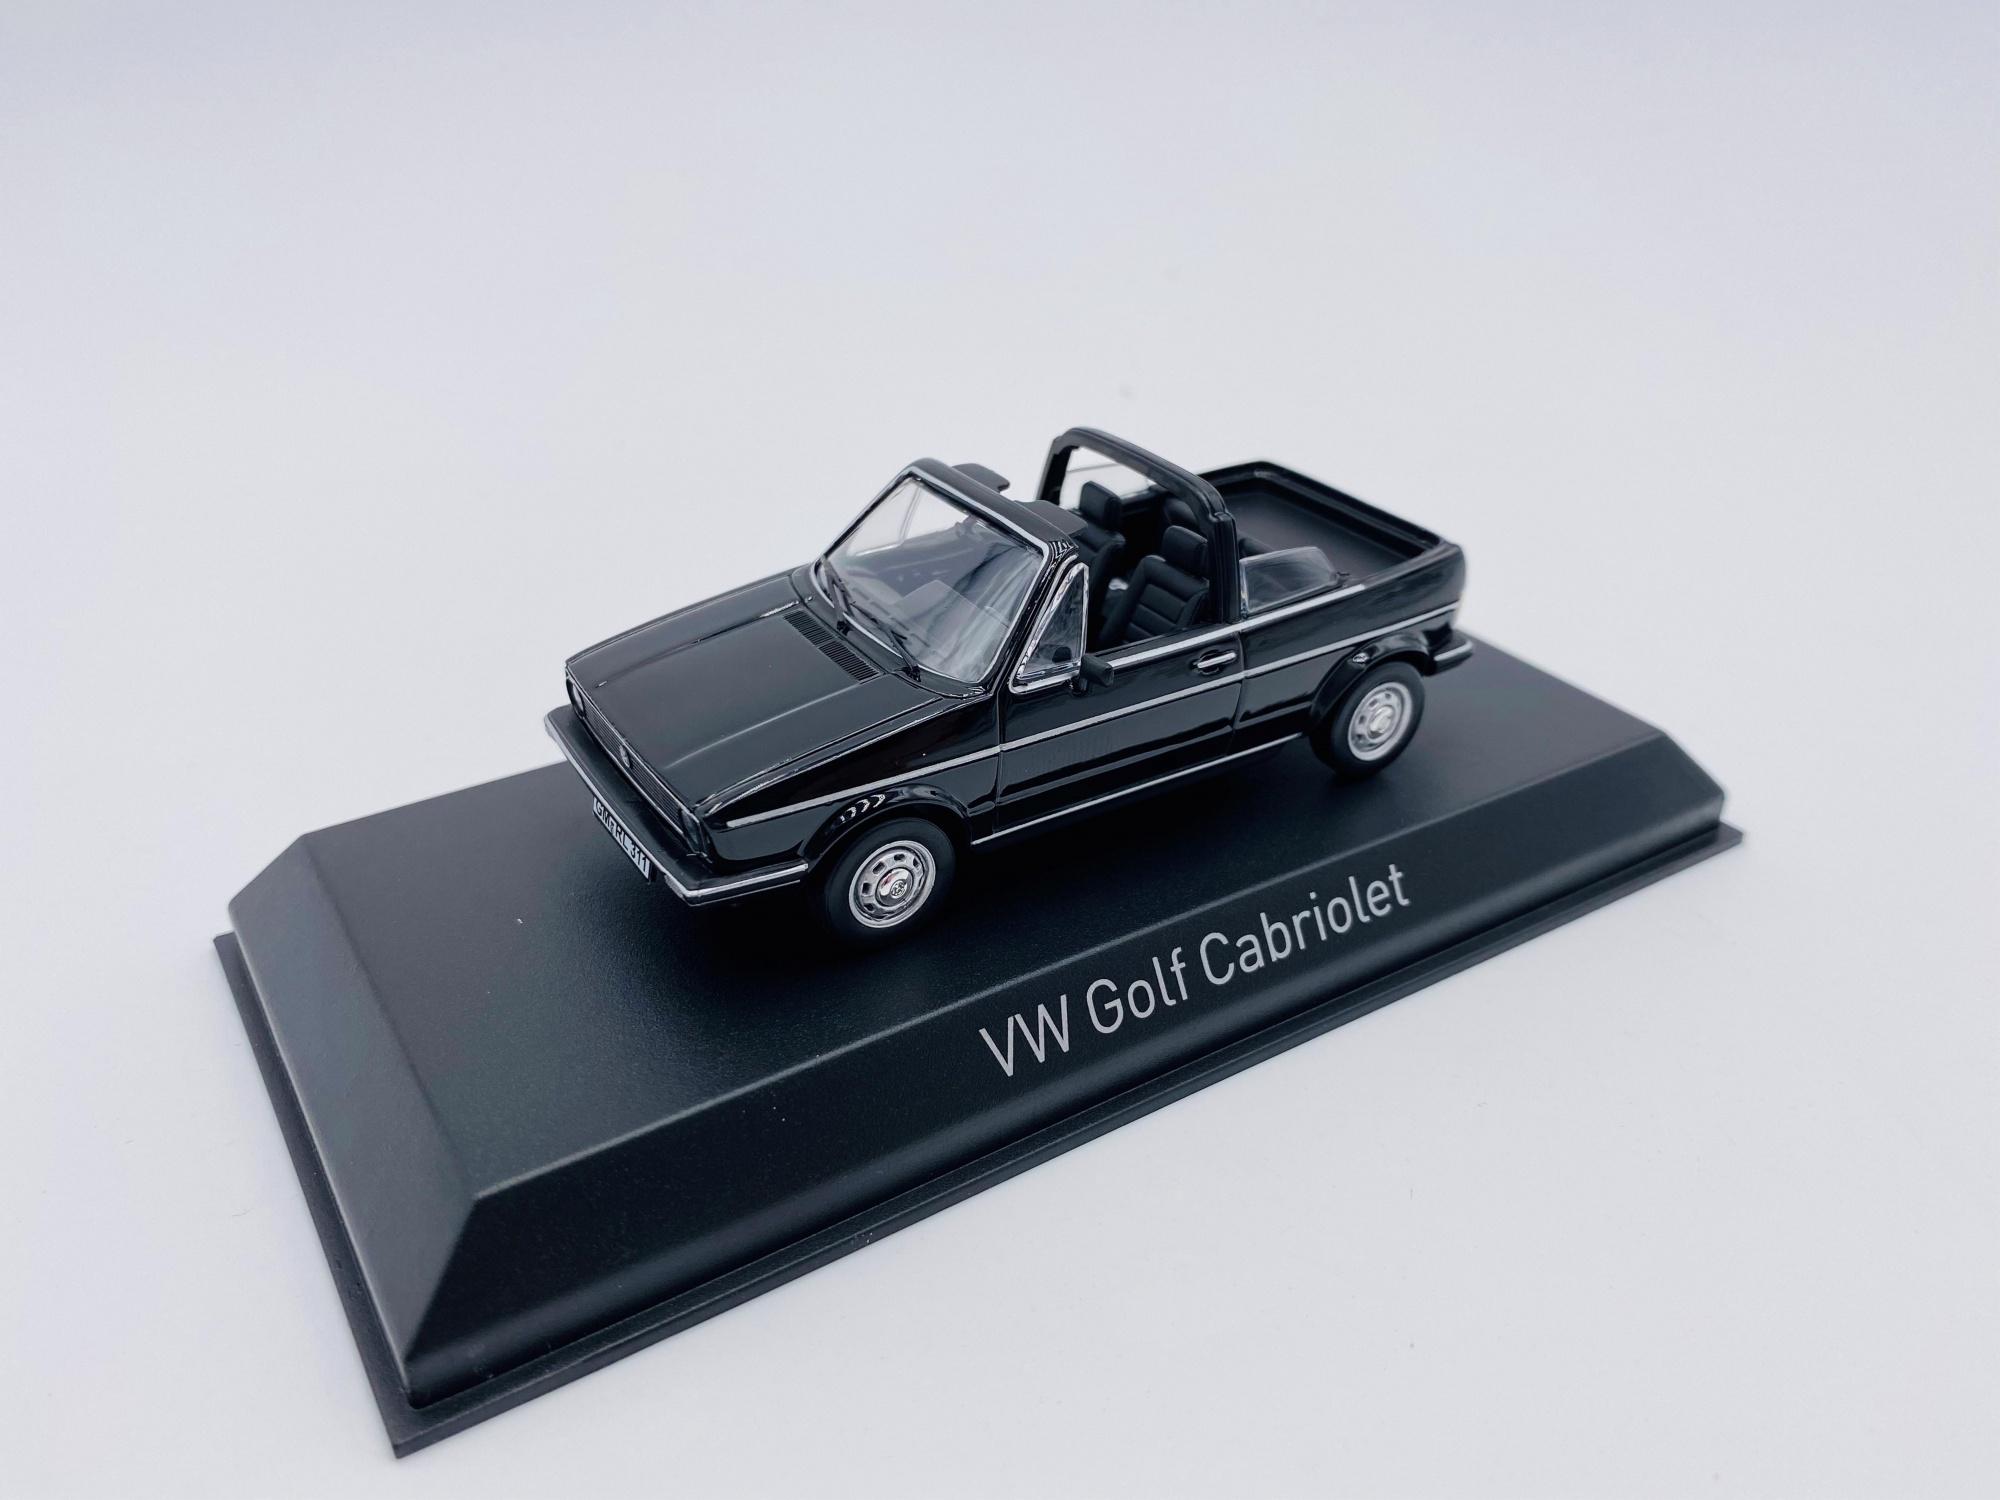 Volkswagen Golf Cabriolet de 1981